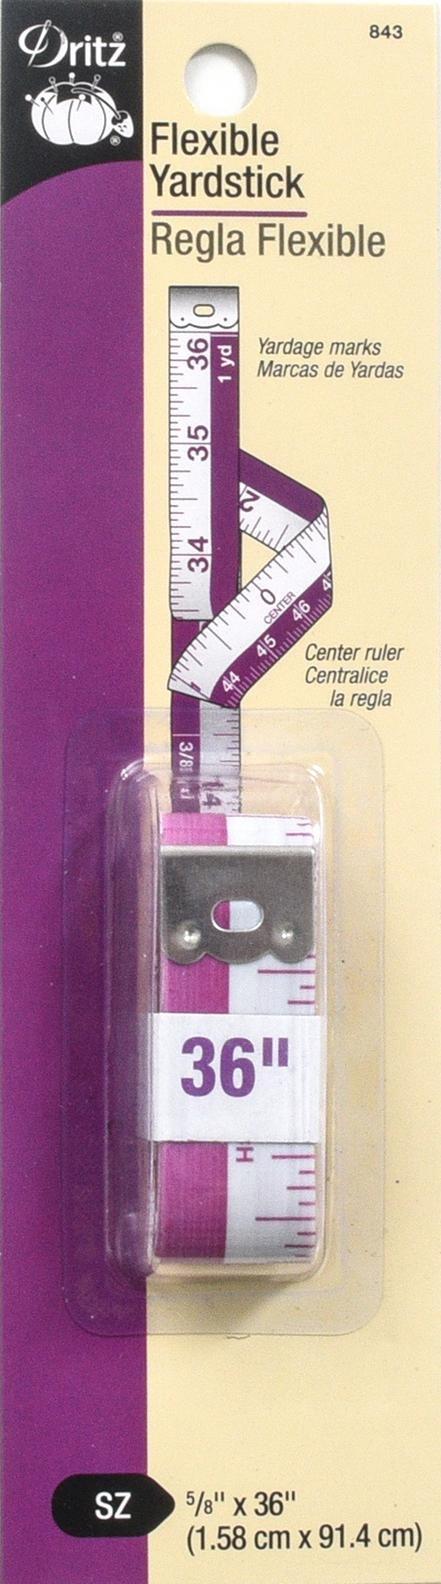 Flexible Yardstick by Dritz